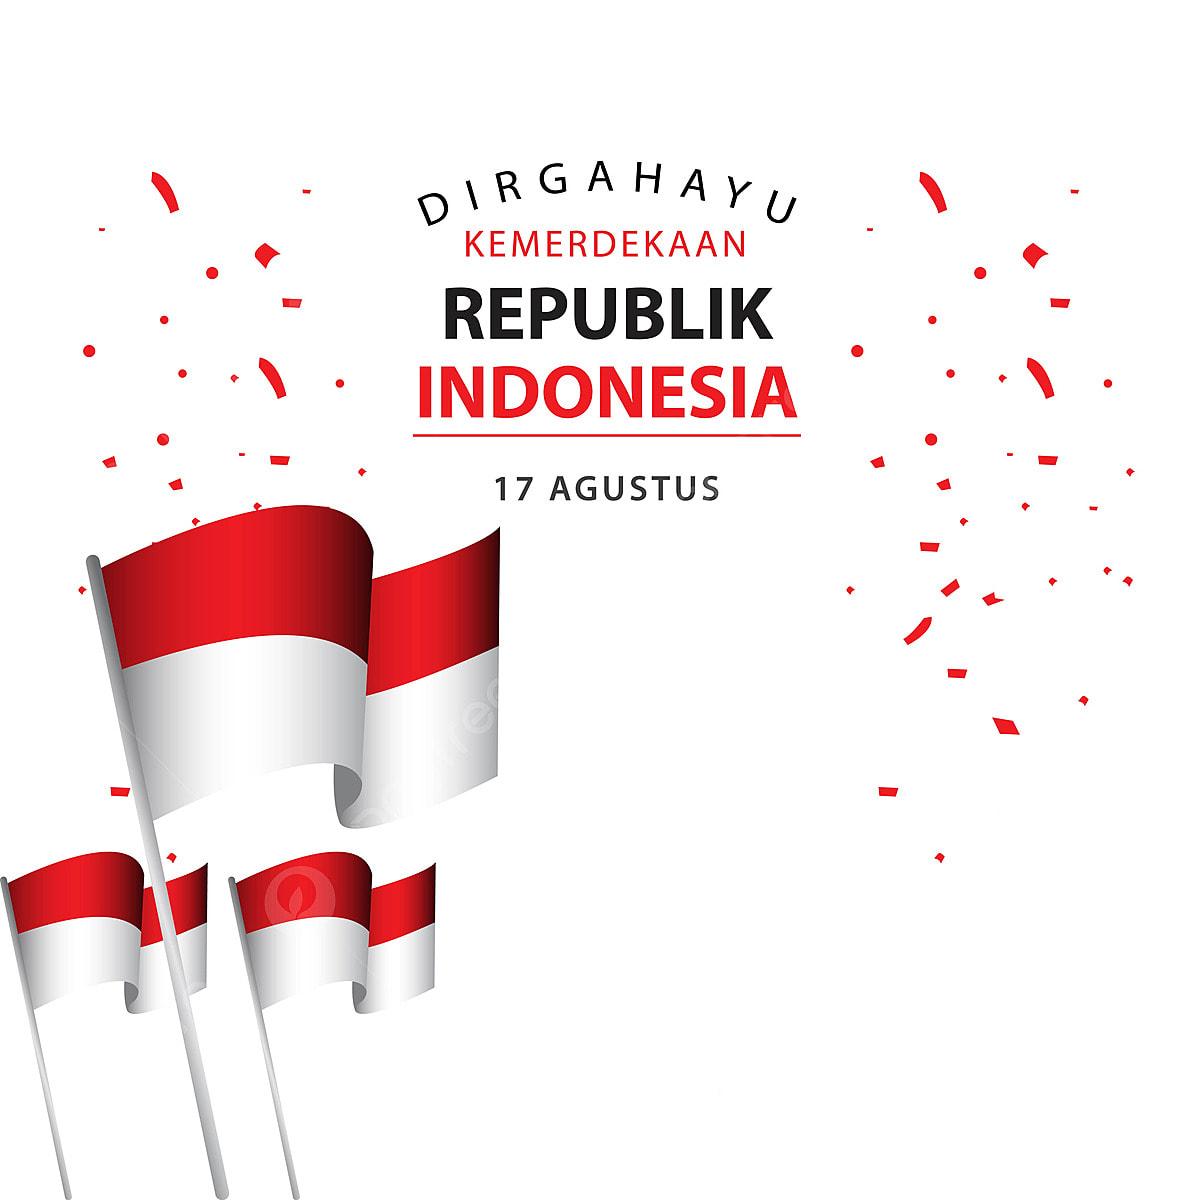 Dirgahayu Kemerdekaan Republik Indonesia Poster Vector Template Design  Illustration, Template Icons, Poster Icons, Indonesia PNG And Vector With  Transparent Background For Free Download